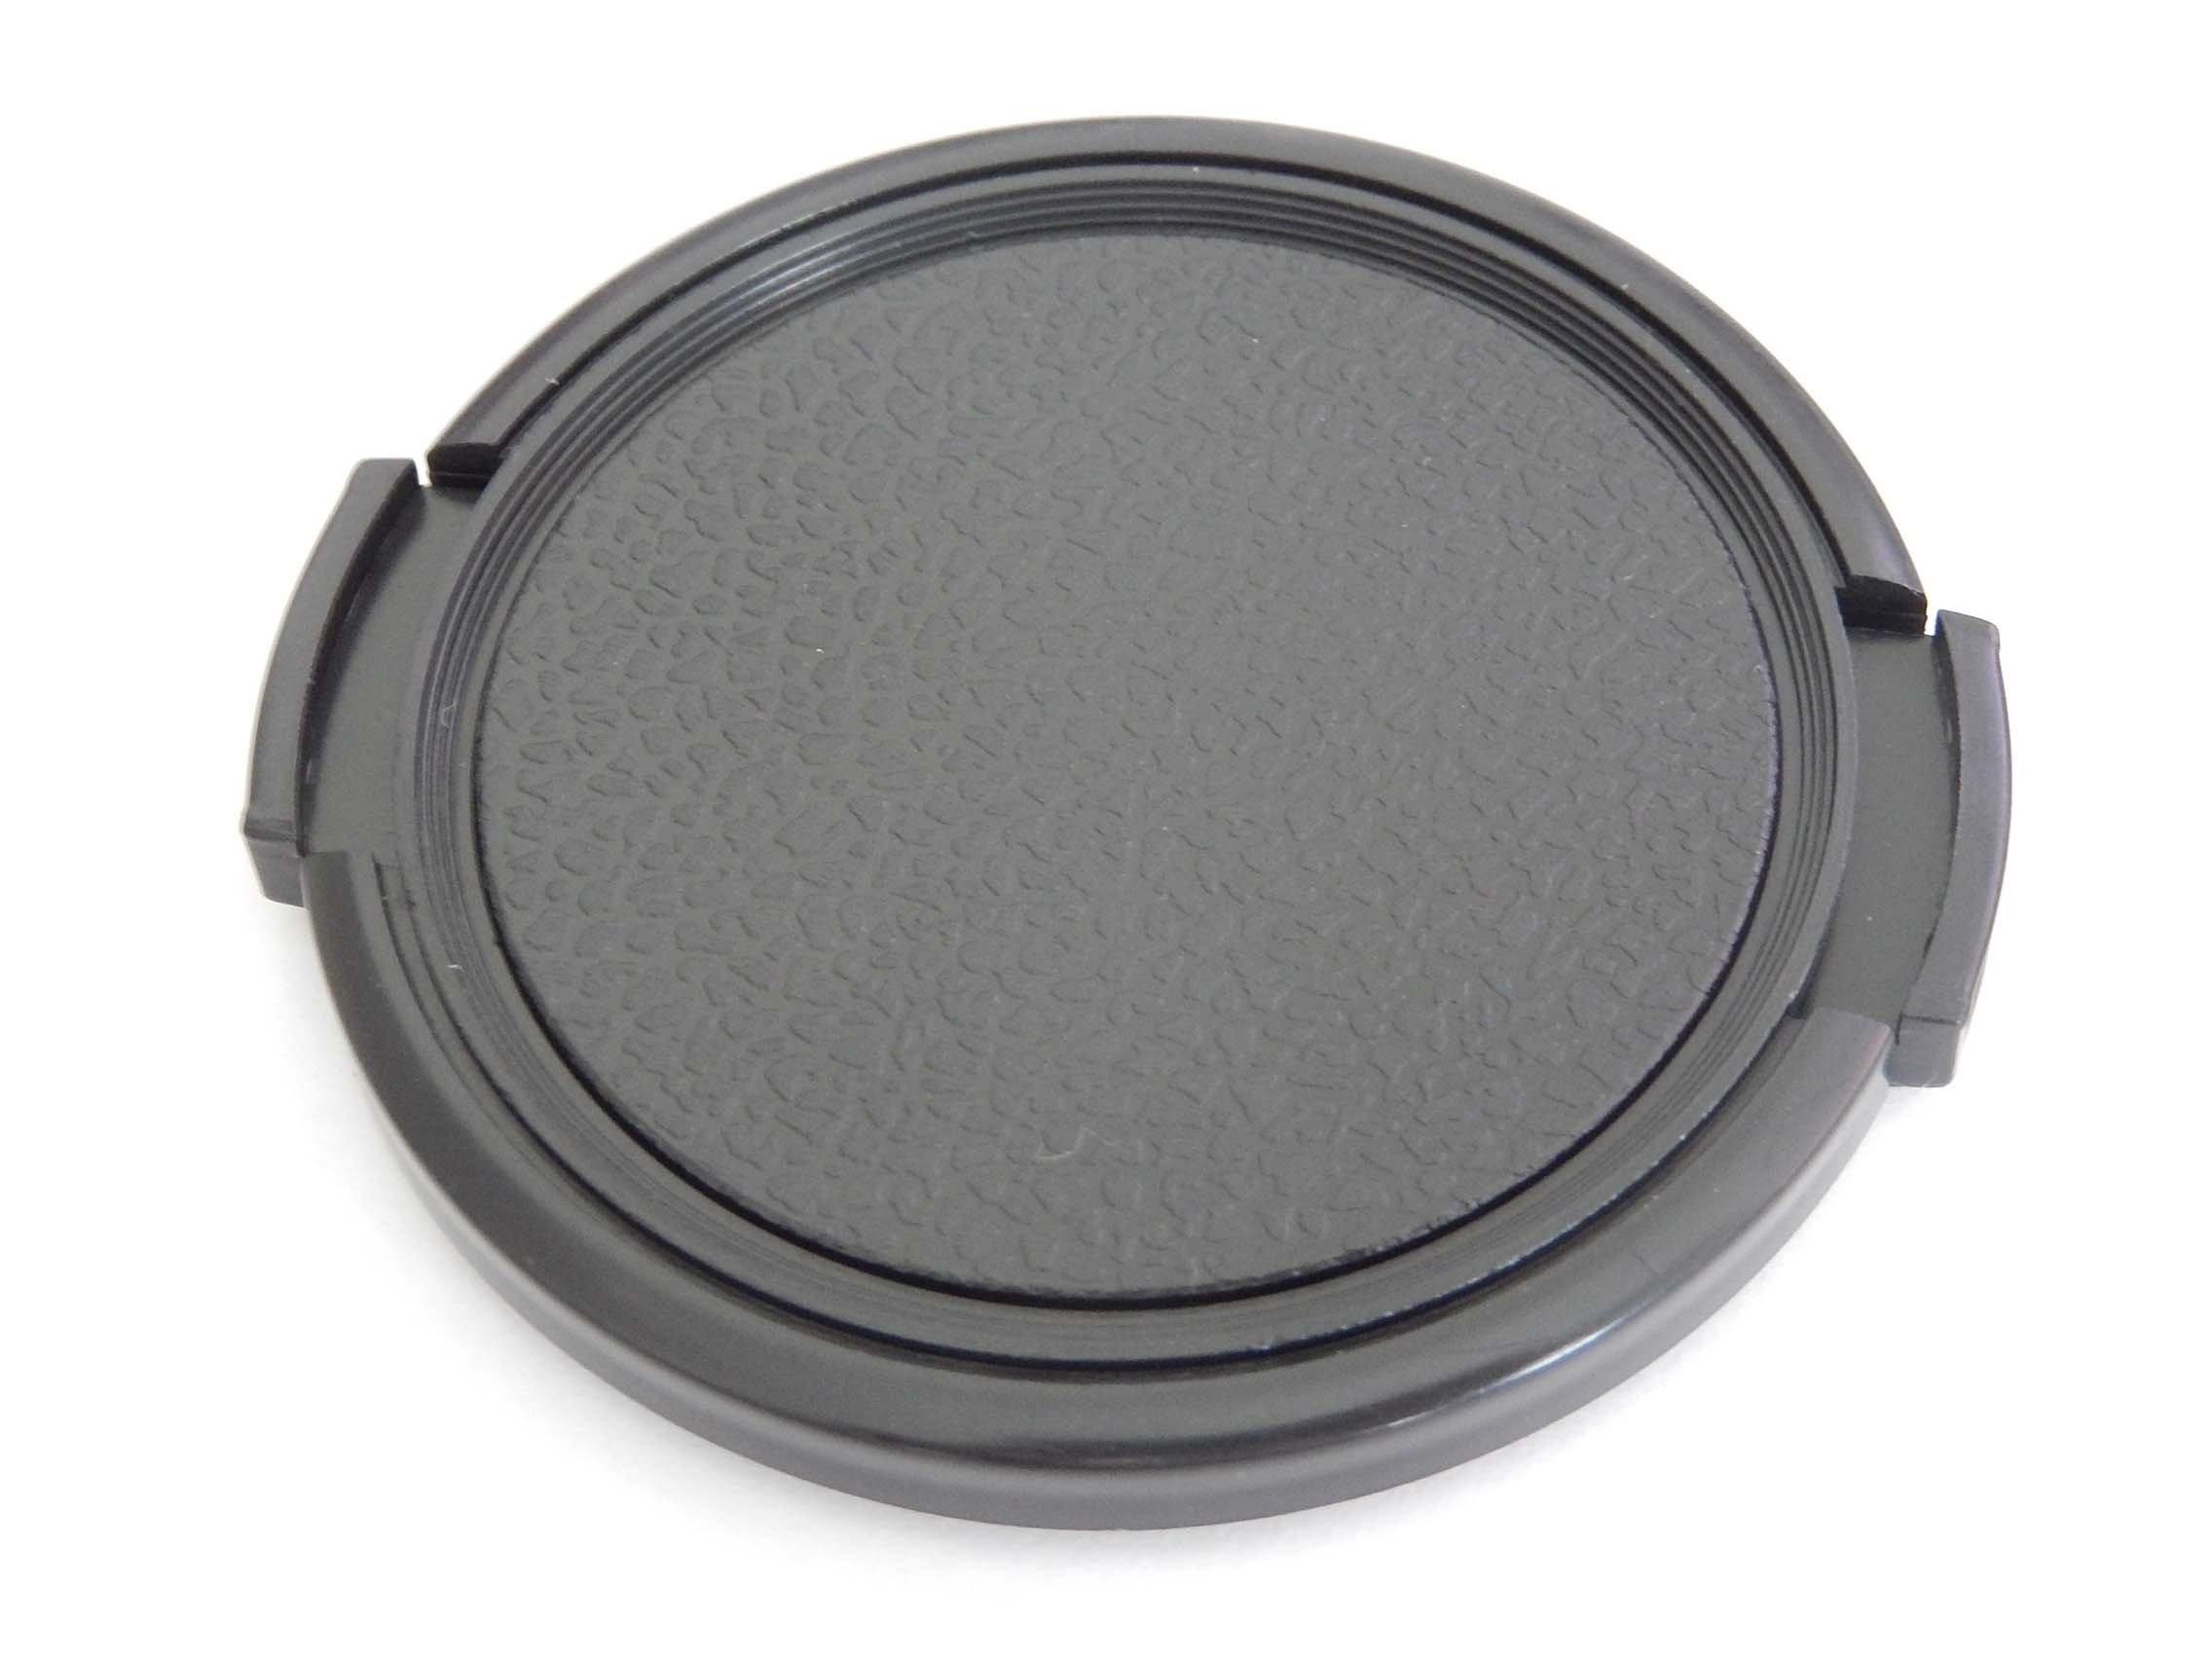 vhbw Copriobiettivo 55 mm per fotocamera Sigma 50 mm 2.8 EX DG Macro, 50-200 mm F4-5.6 DC OS HSM, 5